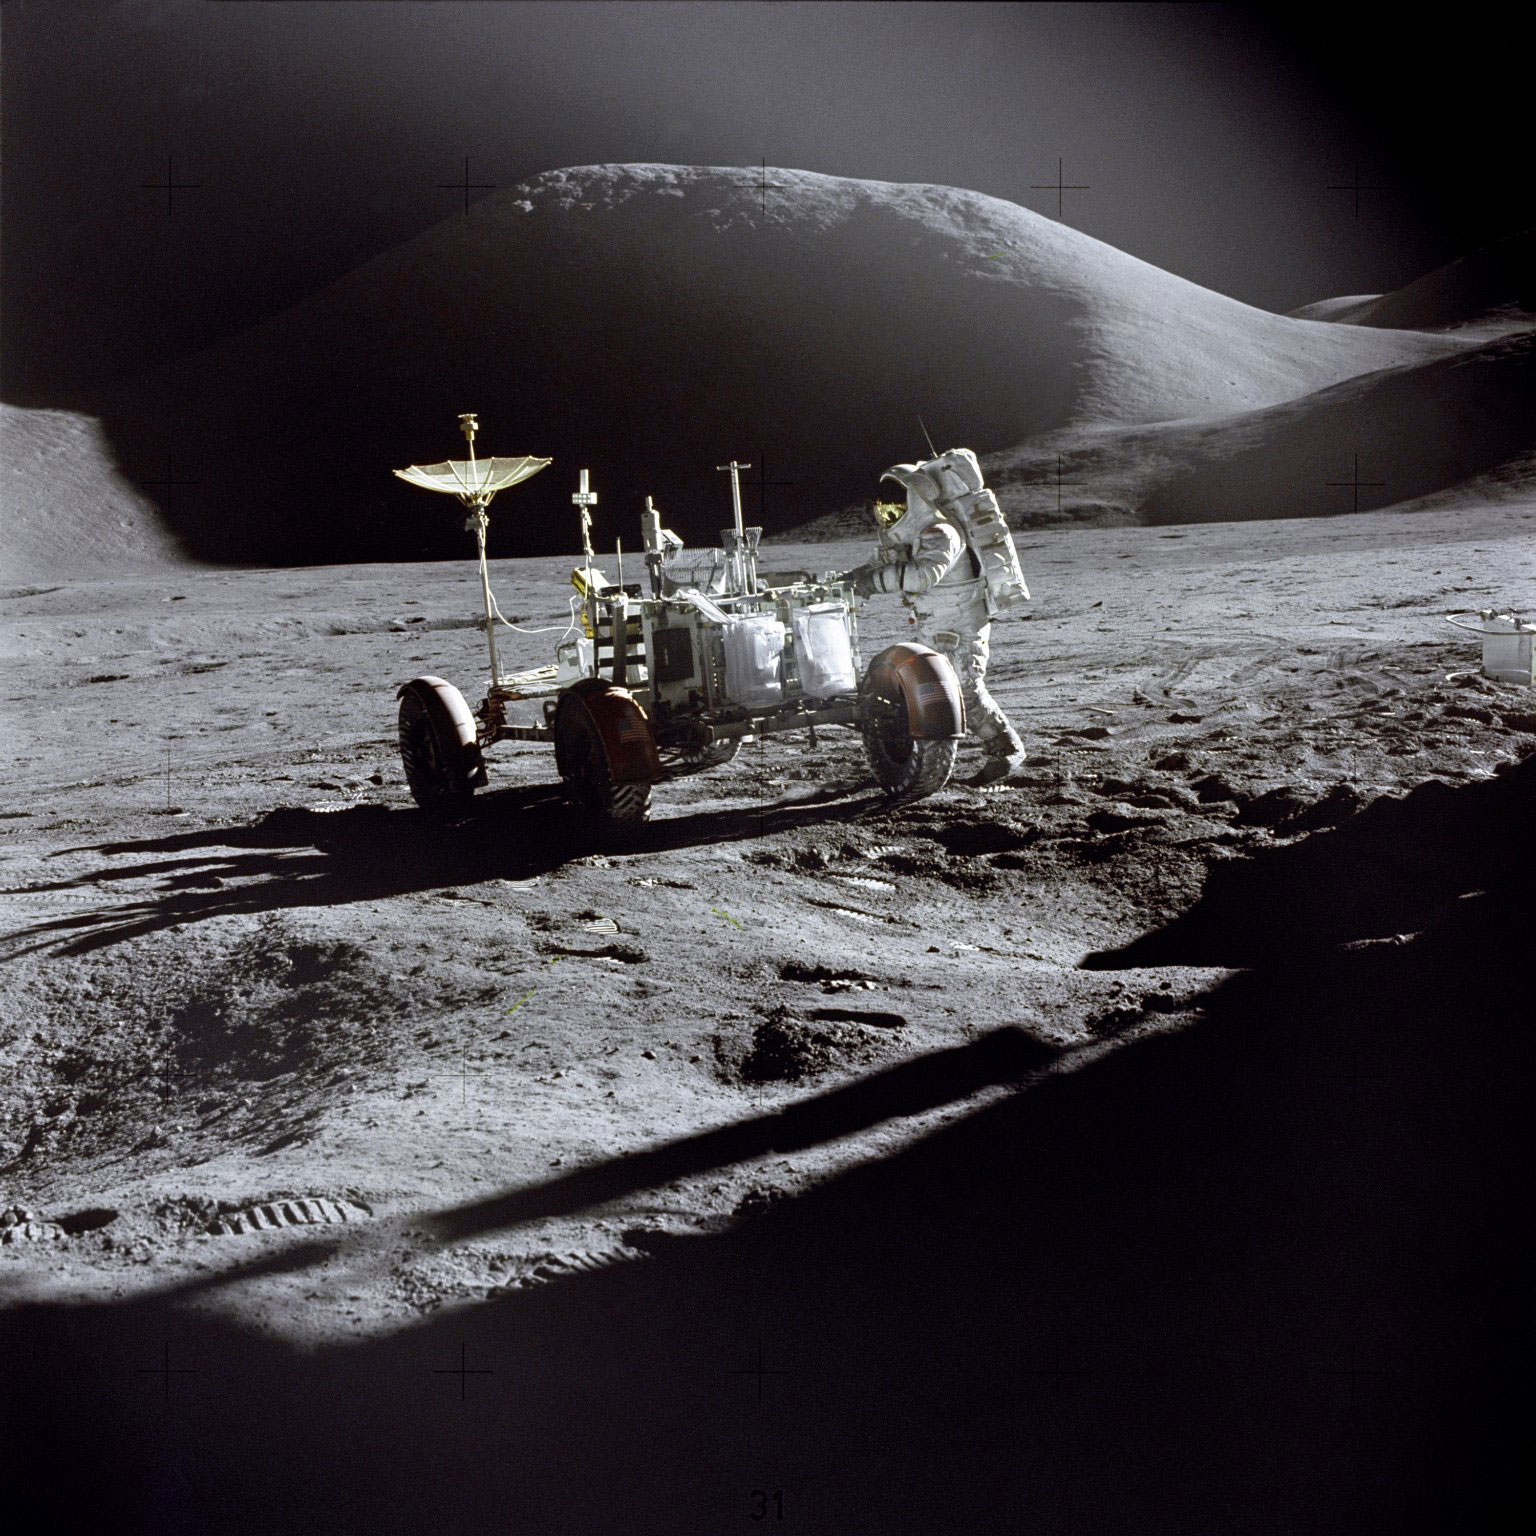 Rovering across the Moon during Apollo 15 - RocketSTEM